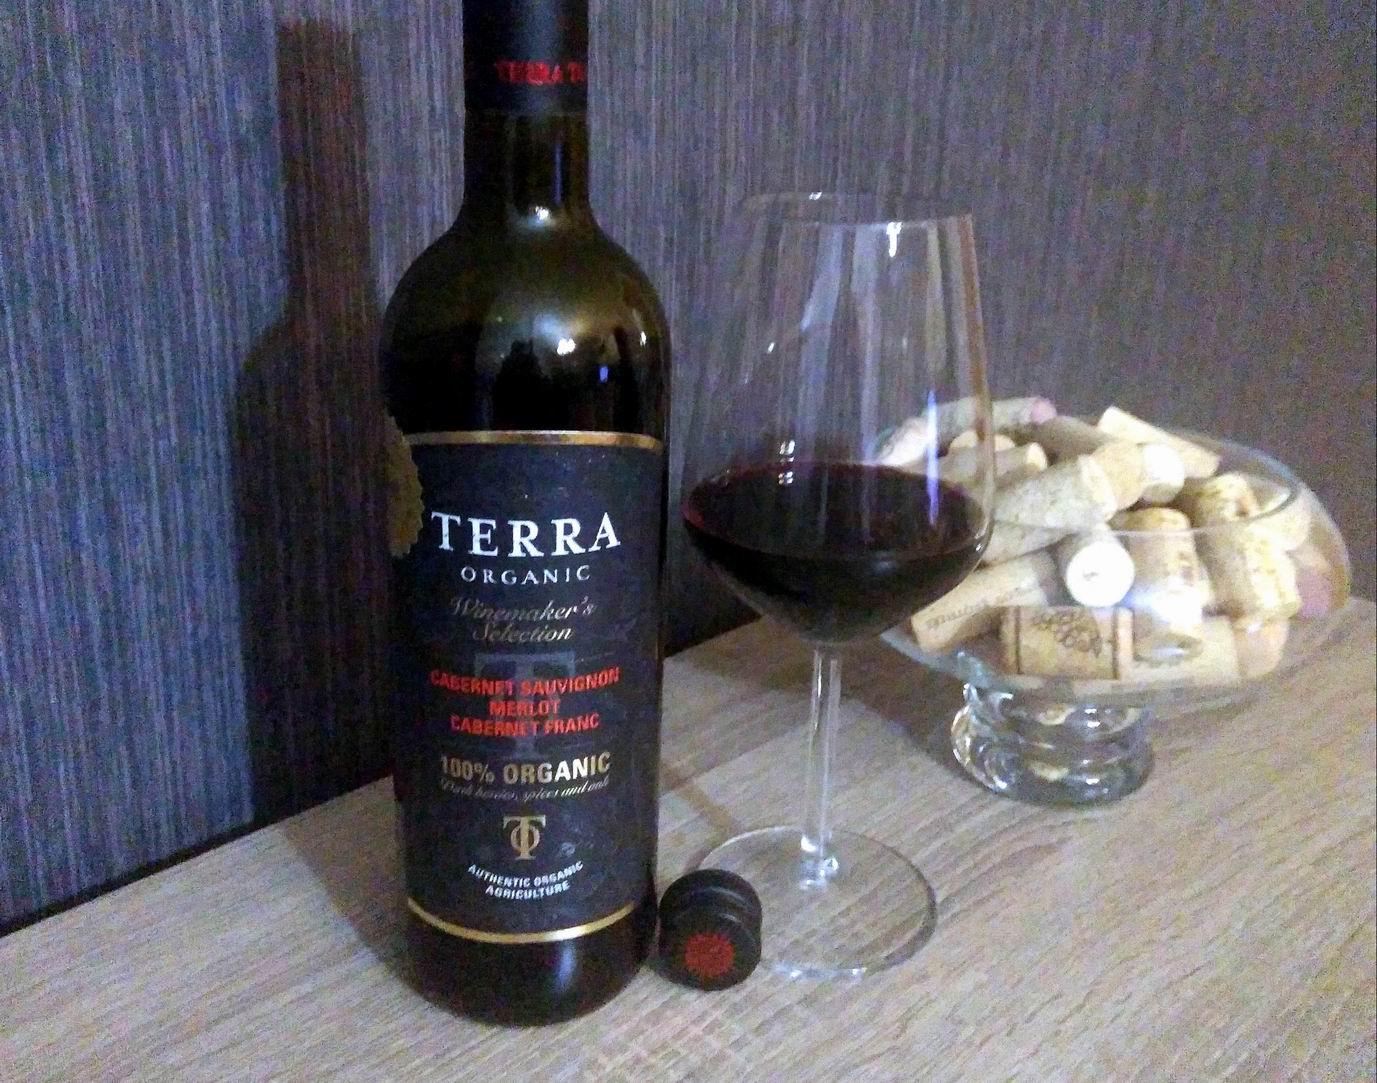 Terra Organic Winemaker's selection 2016 – Terra Tangra